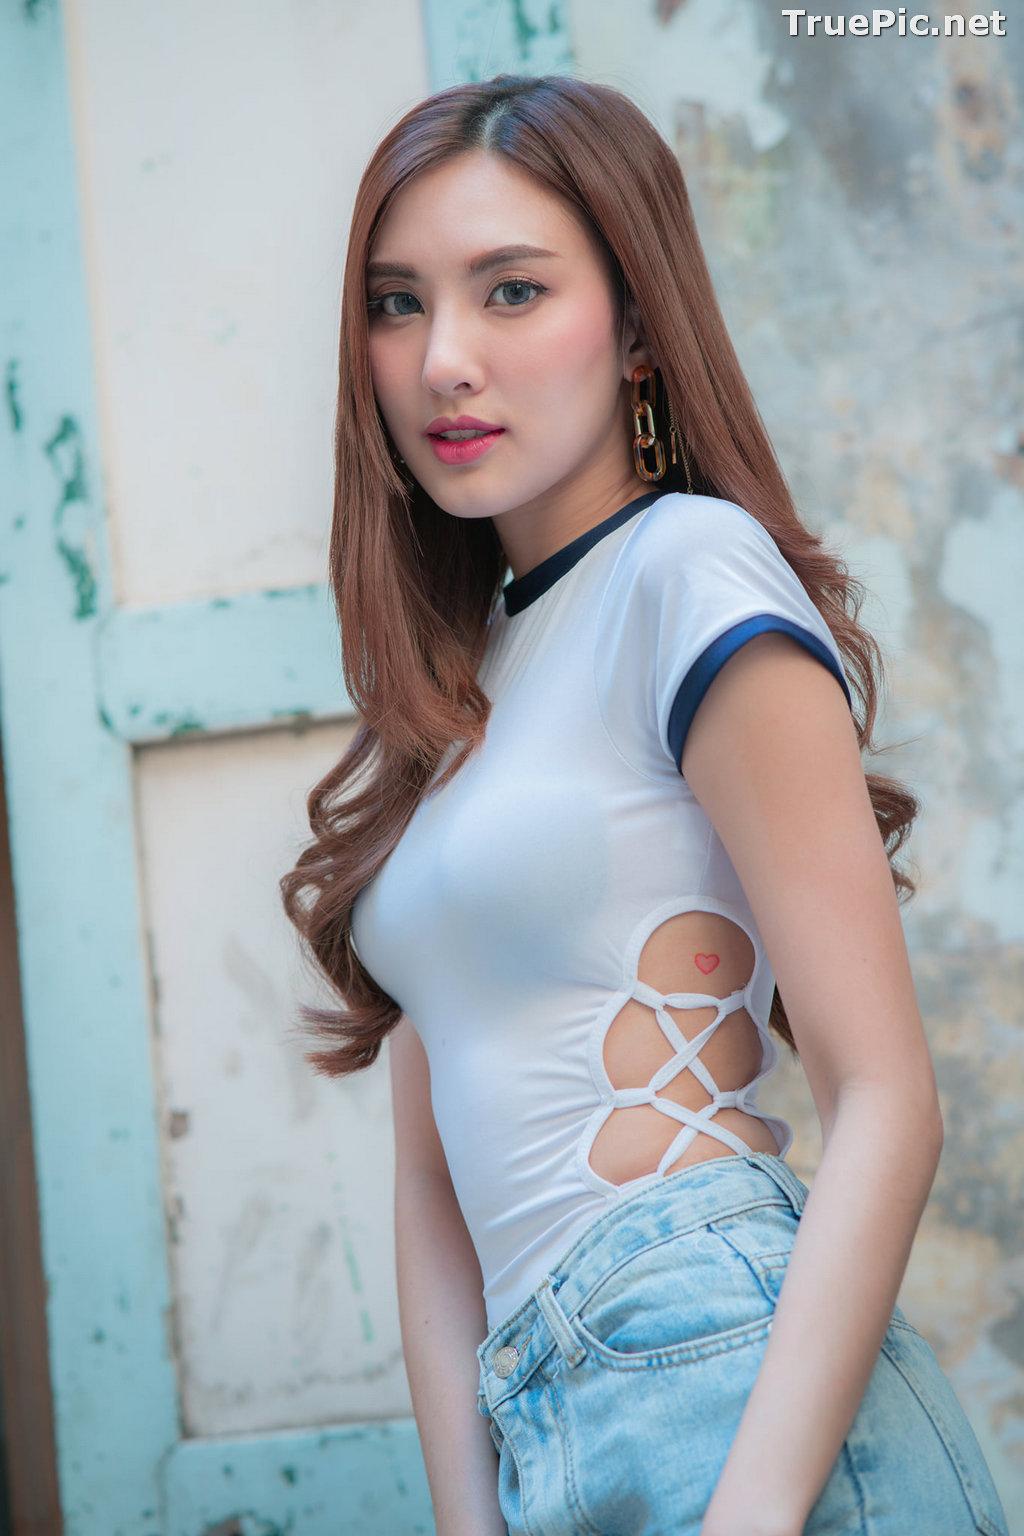 Image Thailand Model - Mynn Sriratampai (Mynn) - Beautiful Picture 2021 Collection - TruePic.net - Picture-10